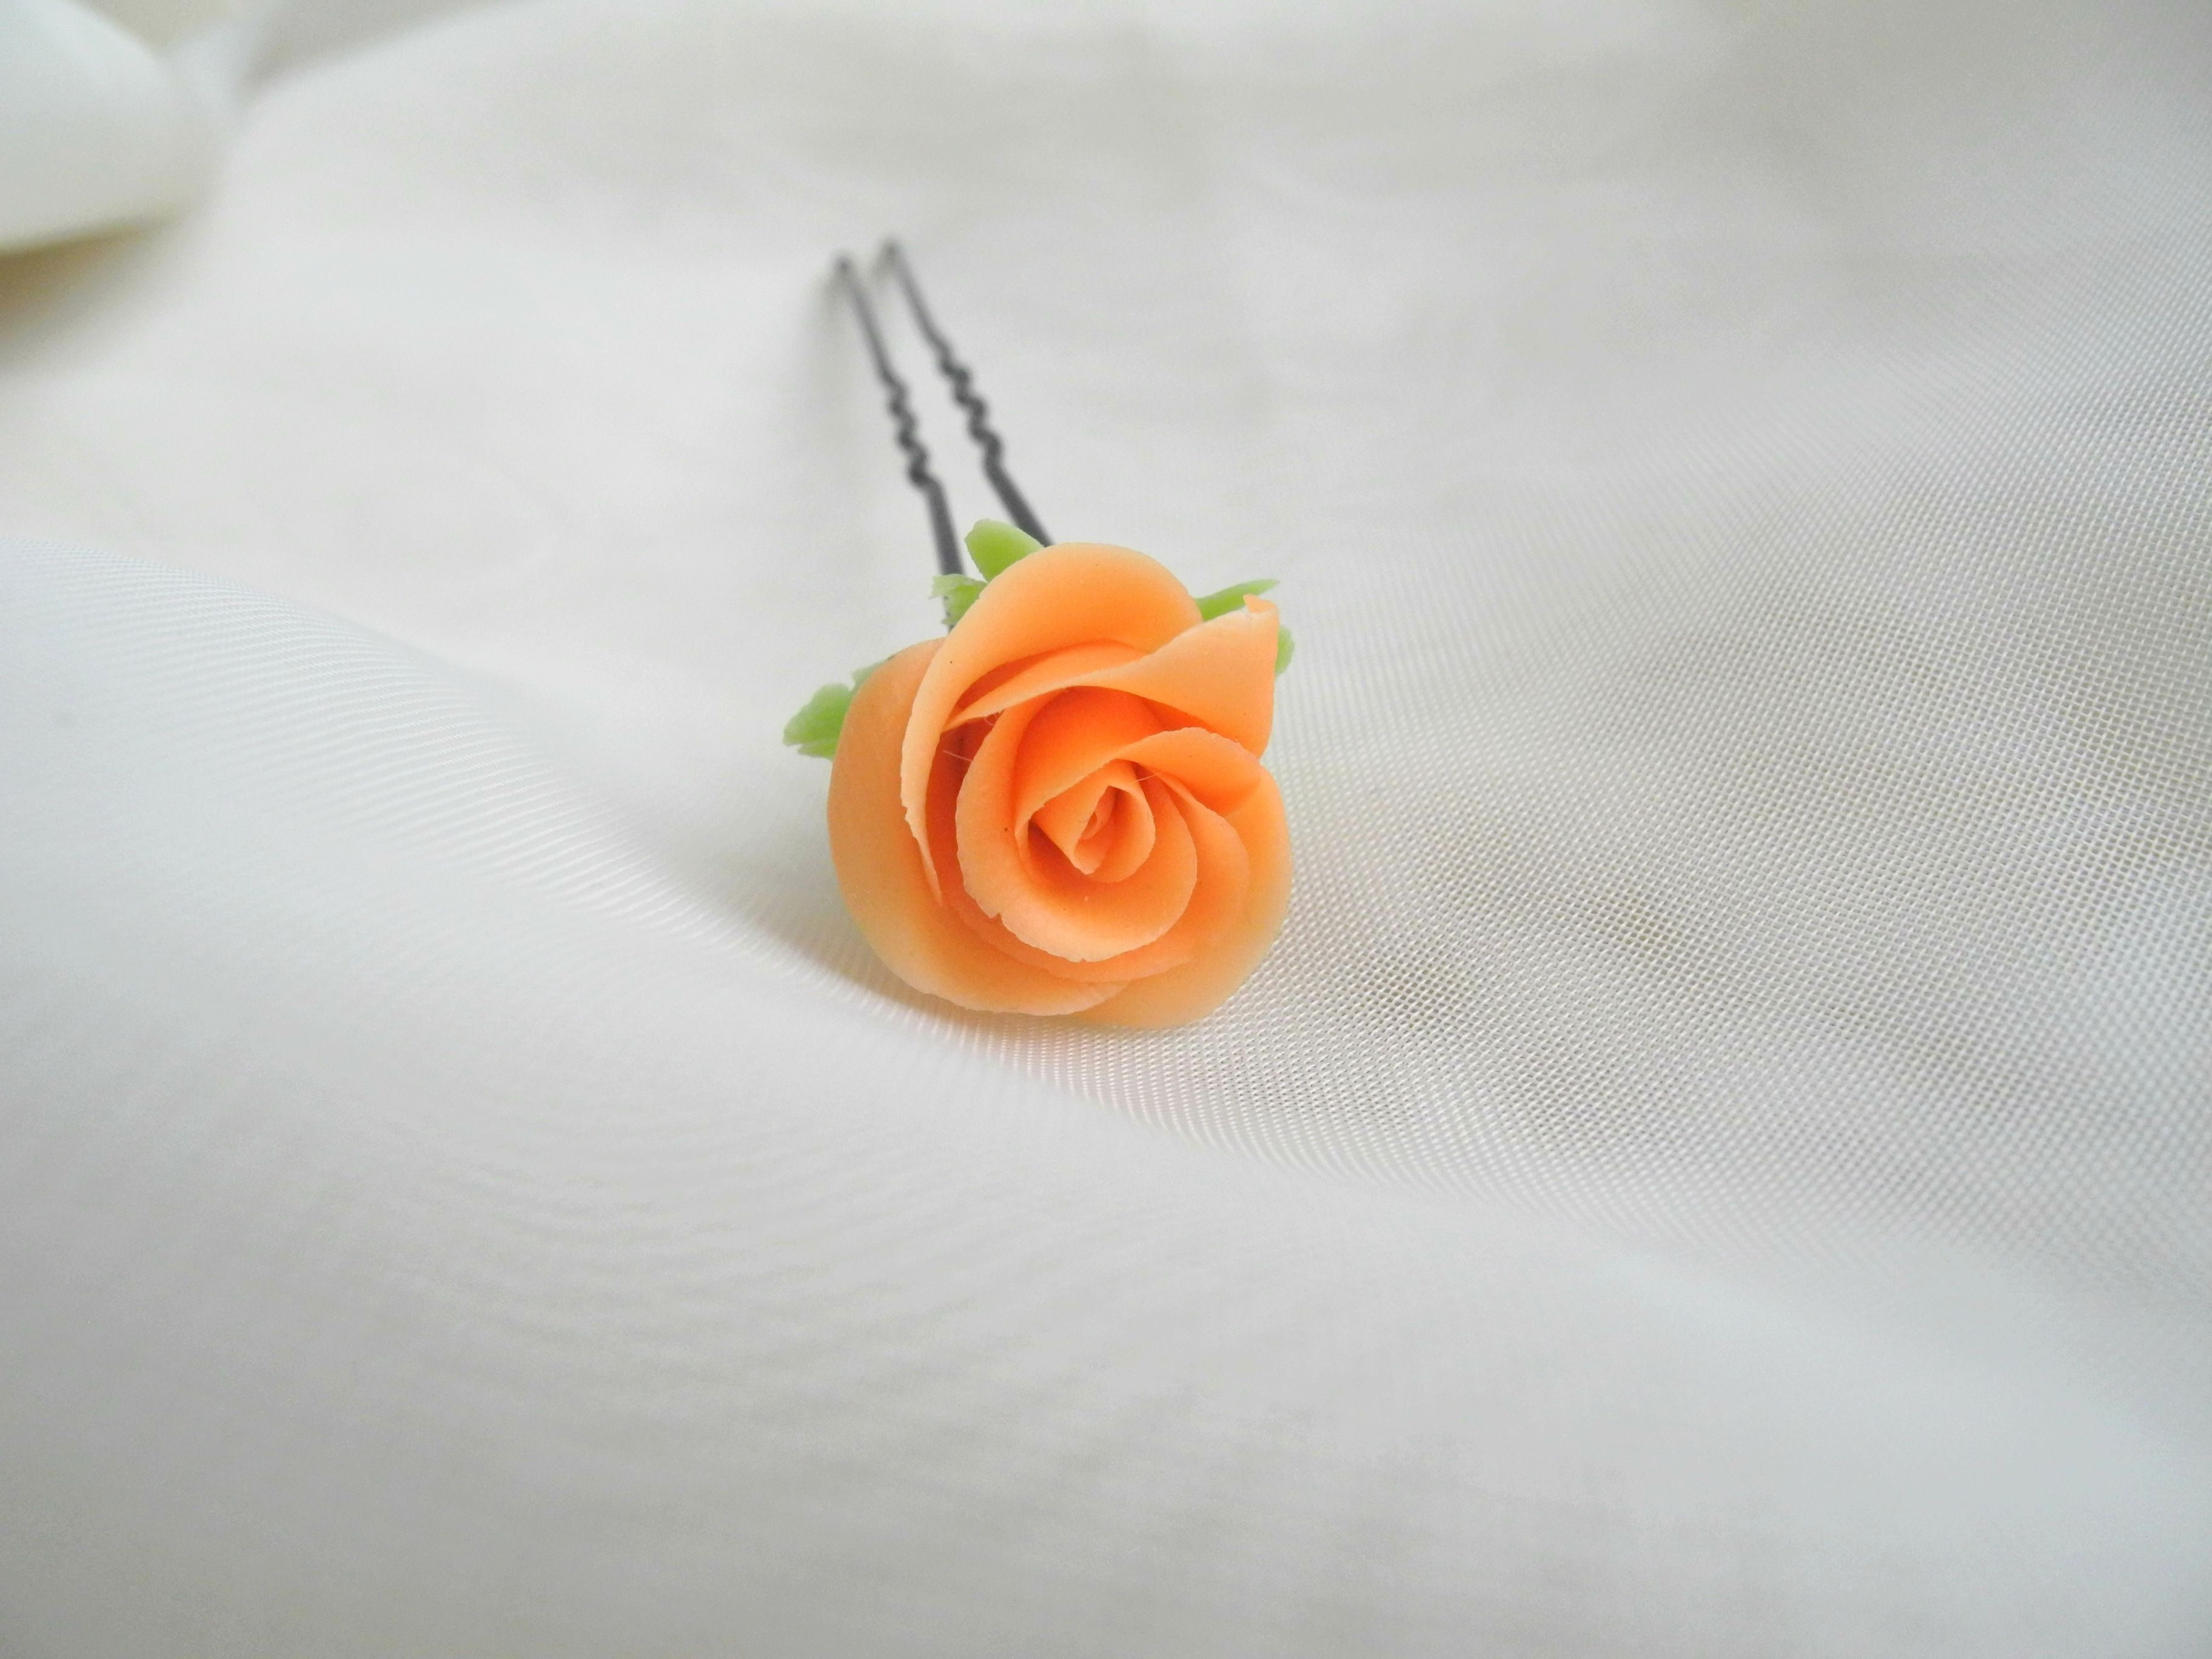 bijou flowers hairpin ceramic bobbypin handmade coldporcelain handmadegift rose